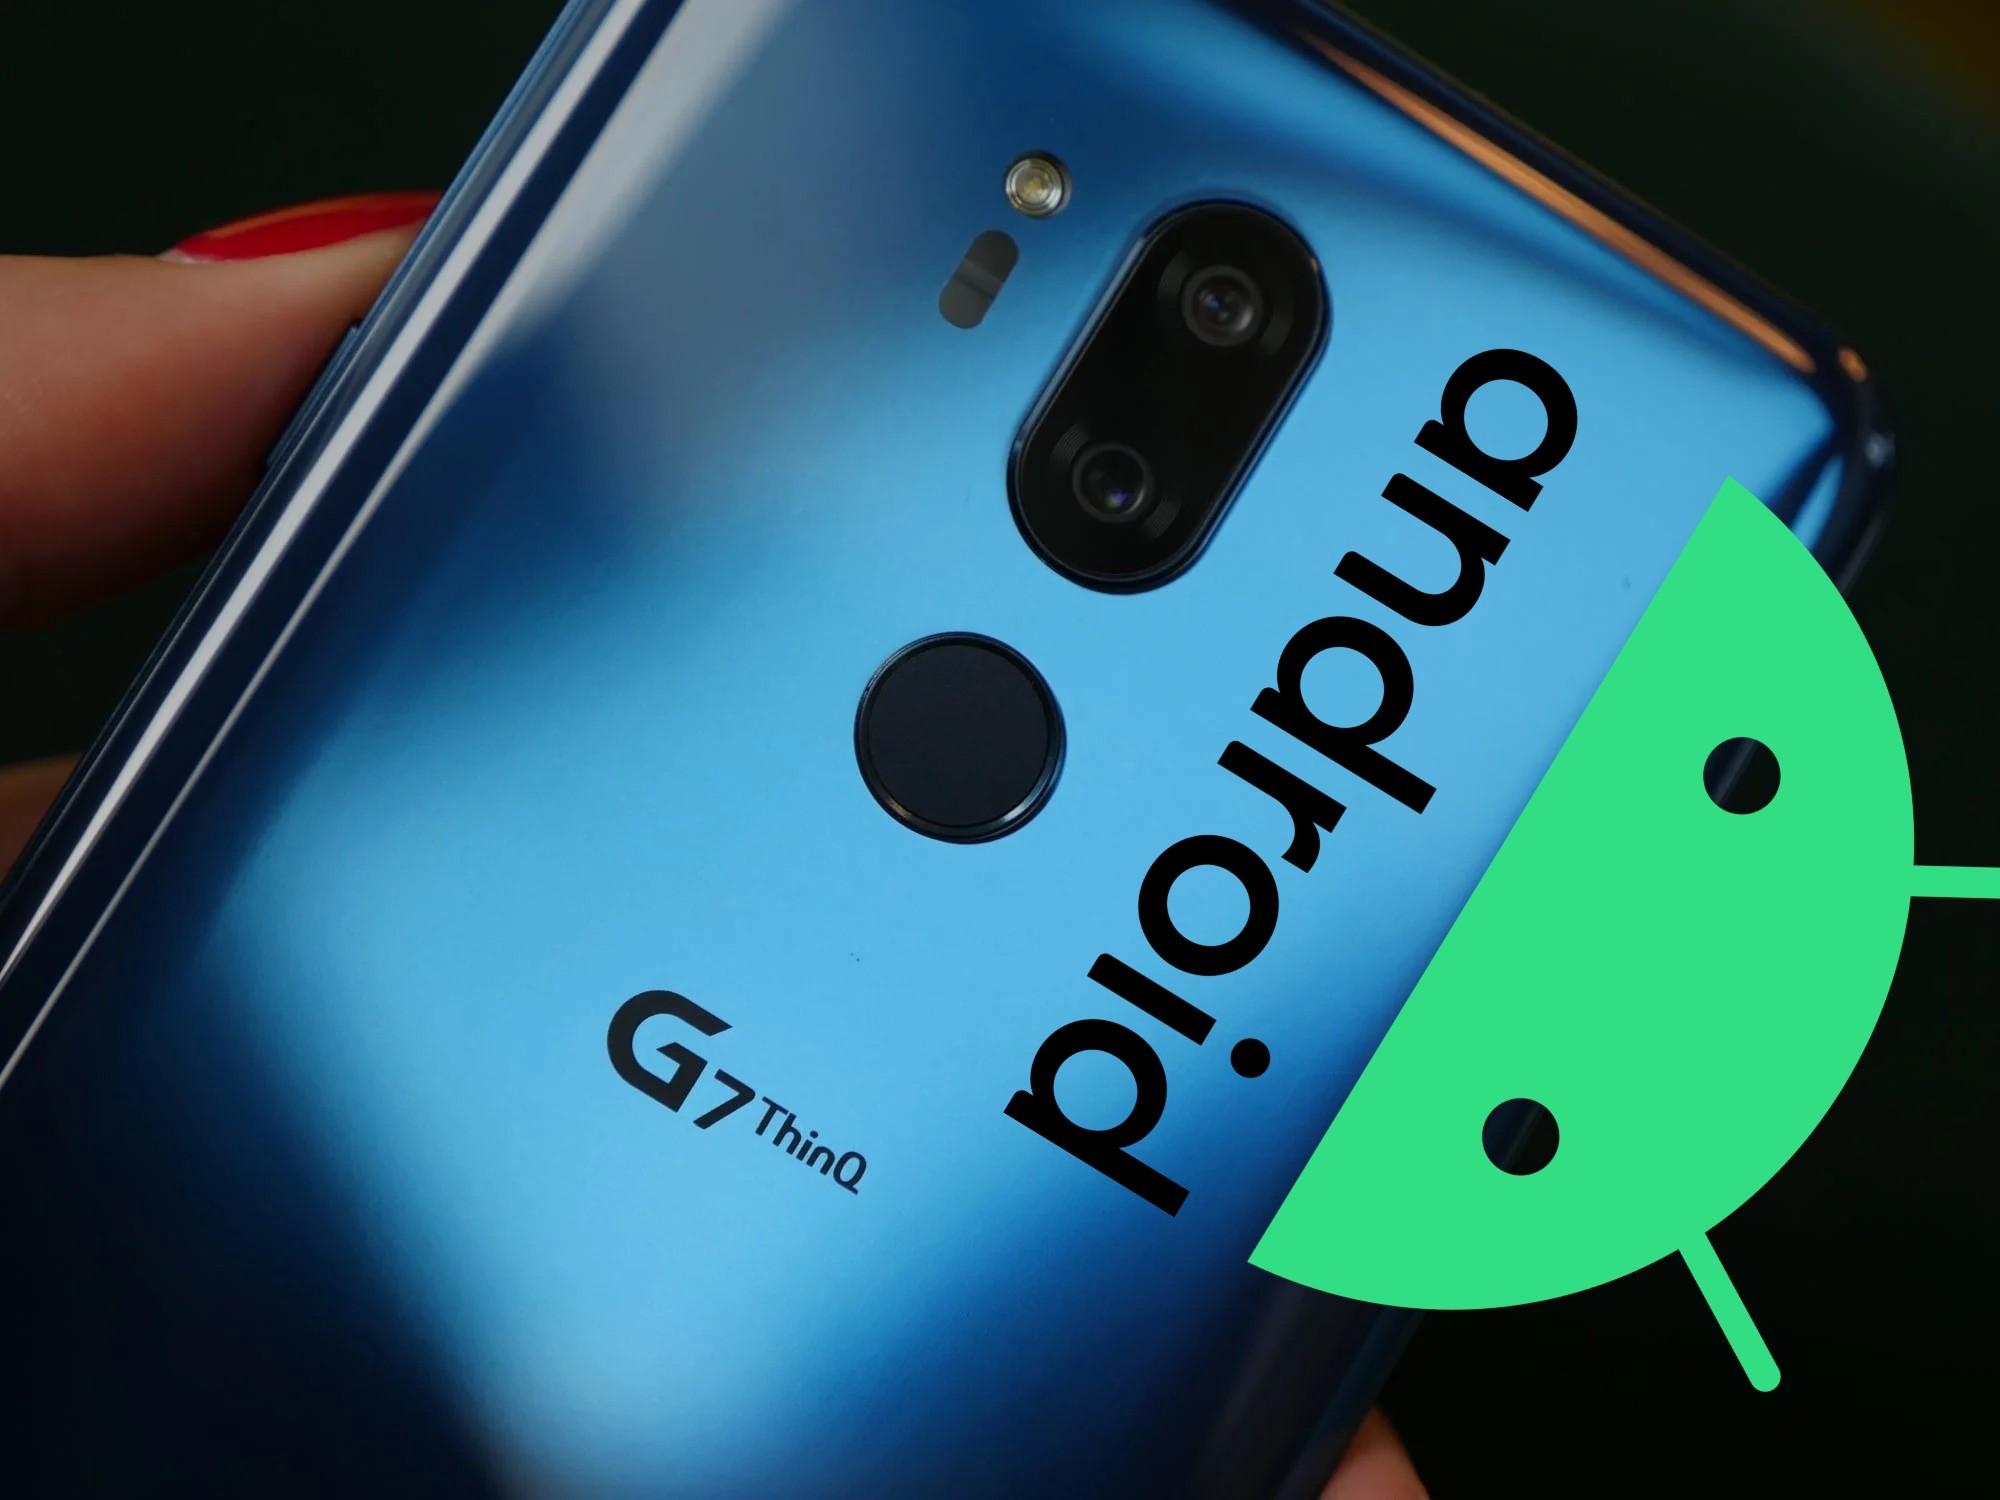 Android 10 trafia na LG G7 ThinQ w Polsce - znakomicie! 18 Android 10